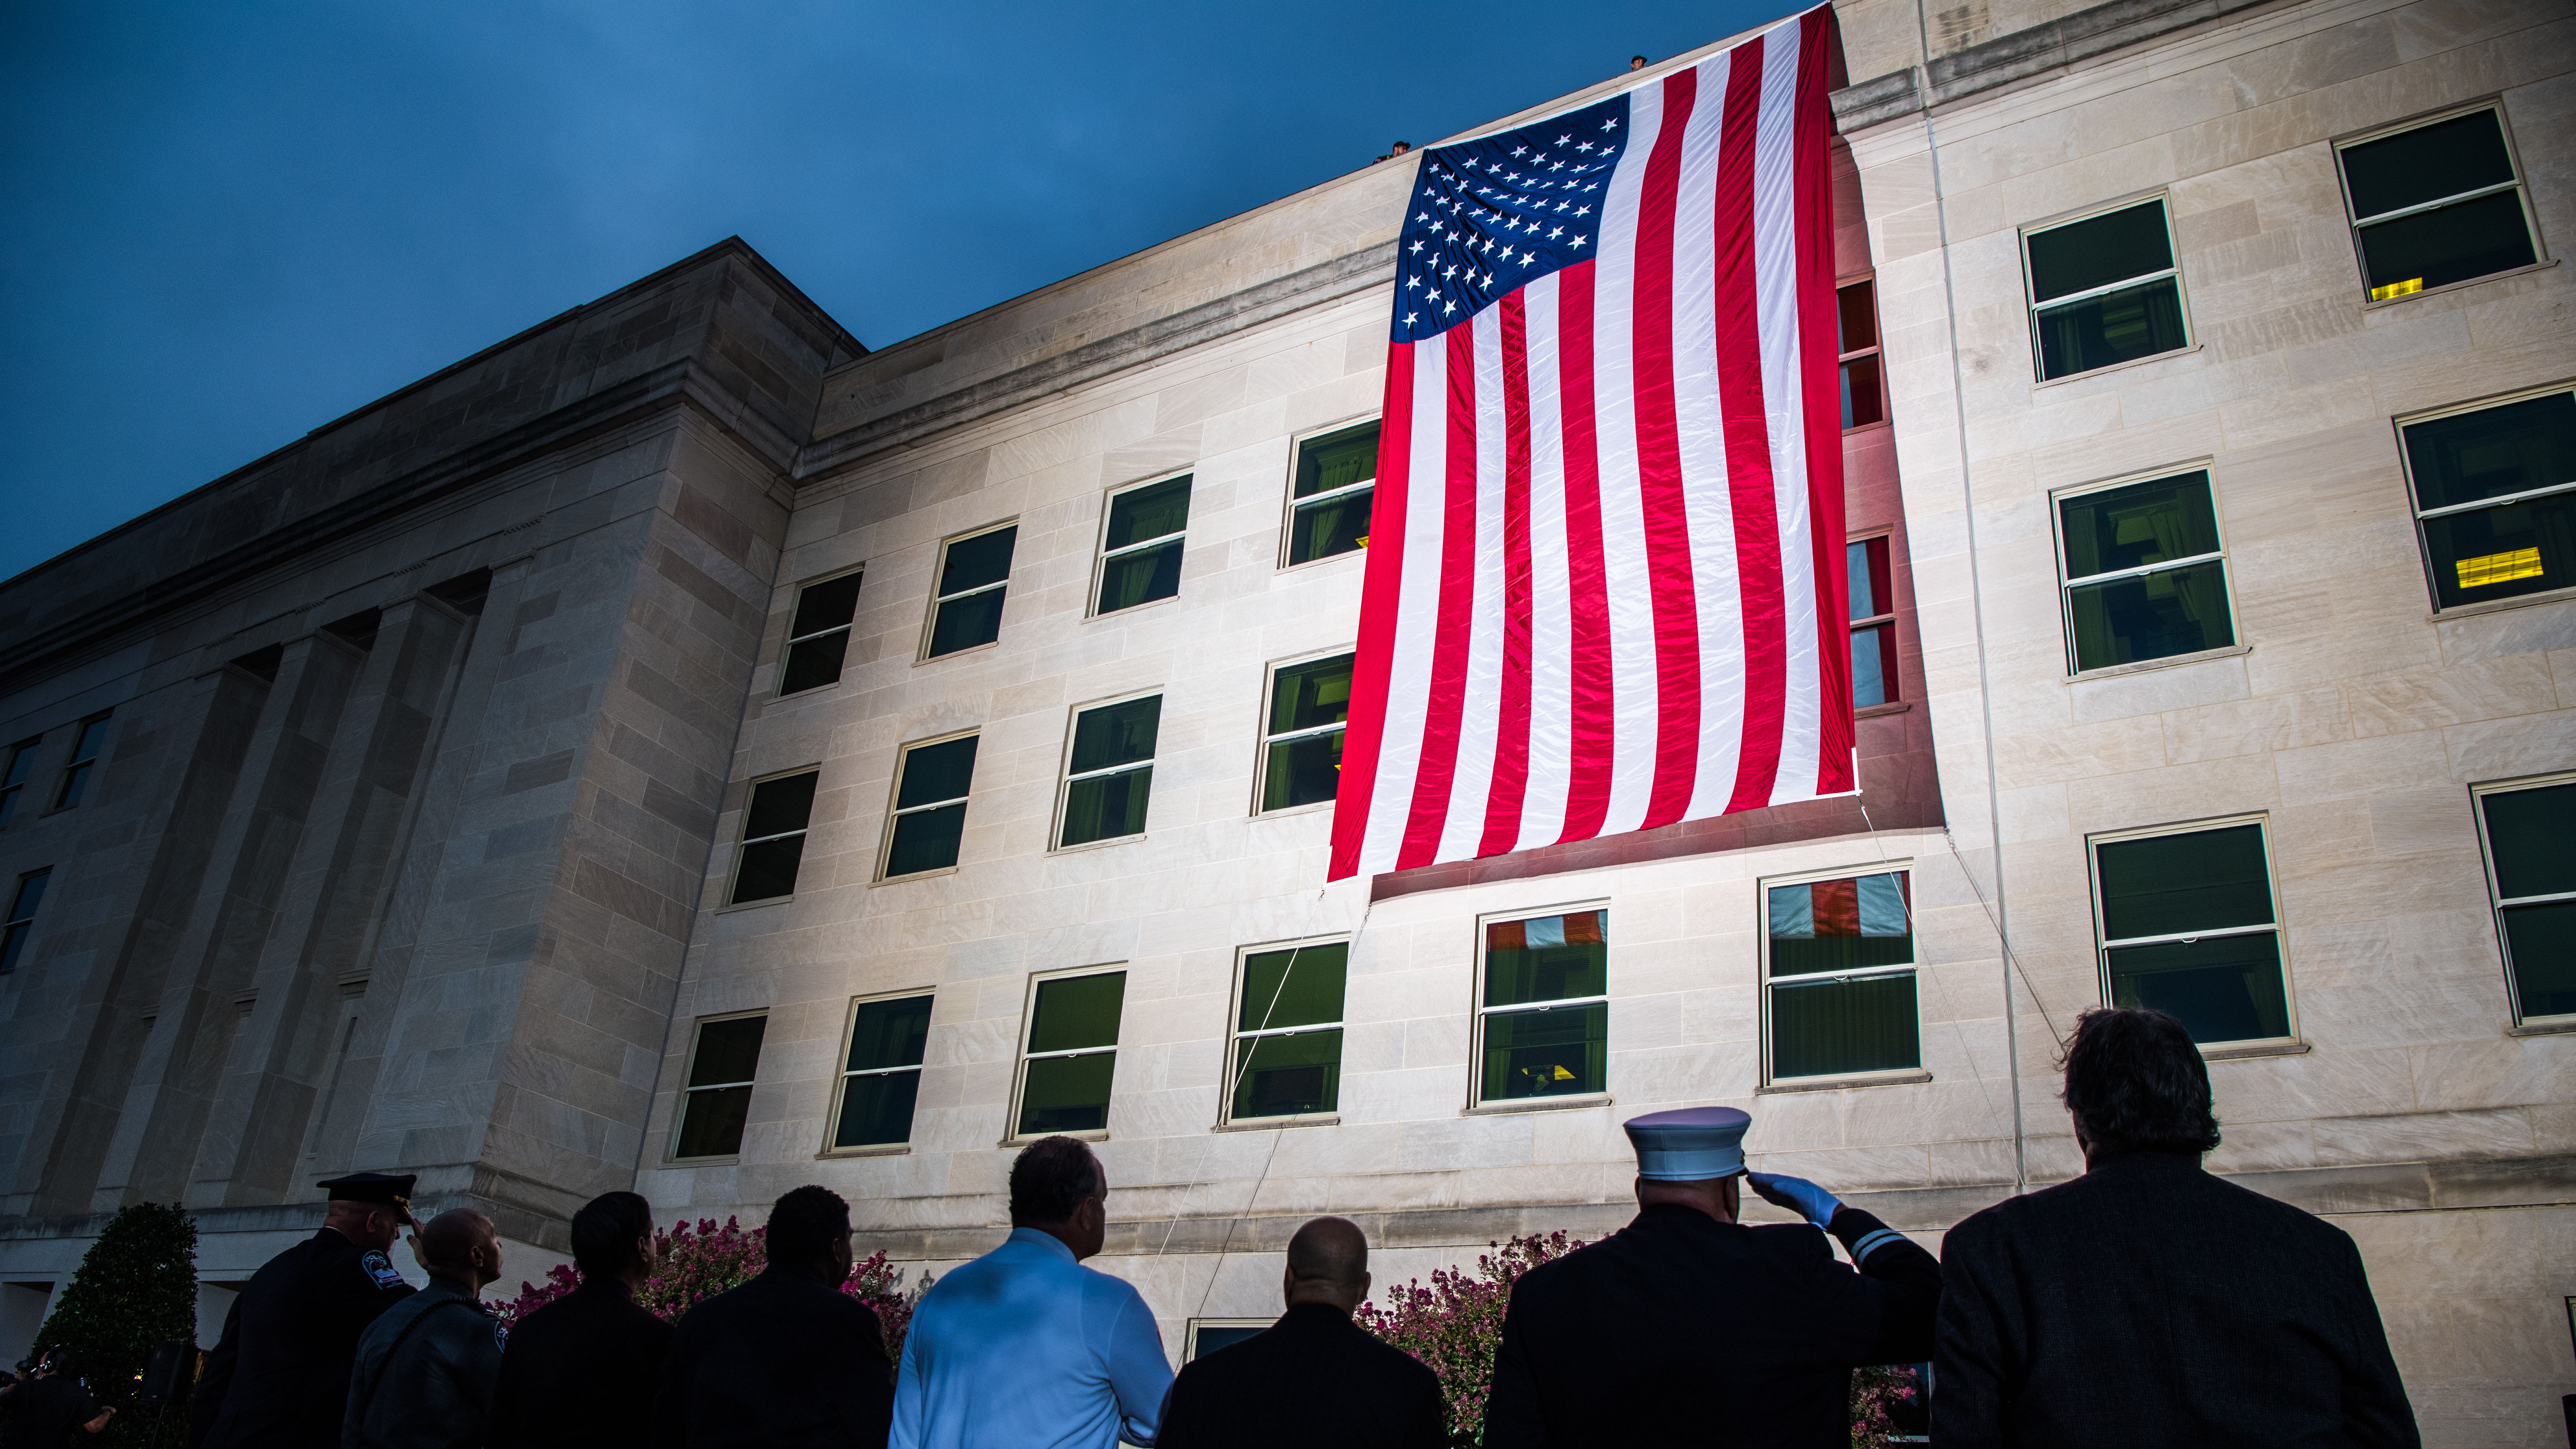 On 9/11 Anniversary, Ham Recalls Courage and Focus